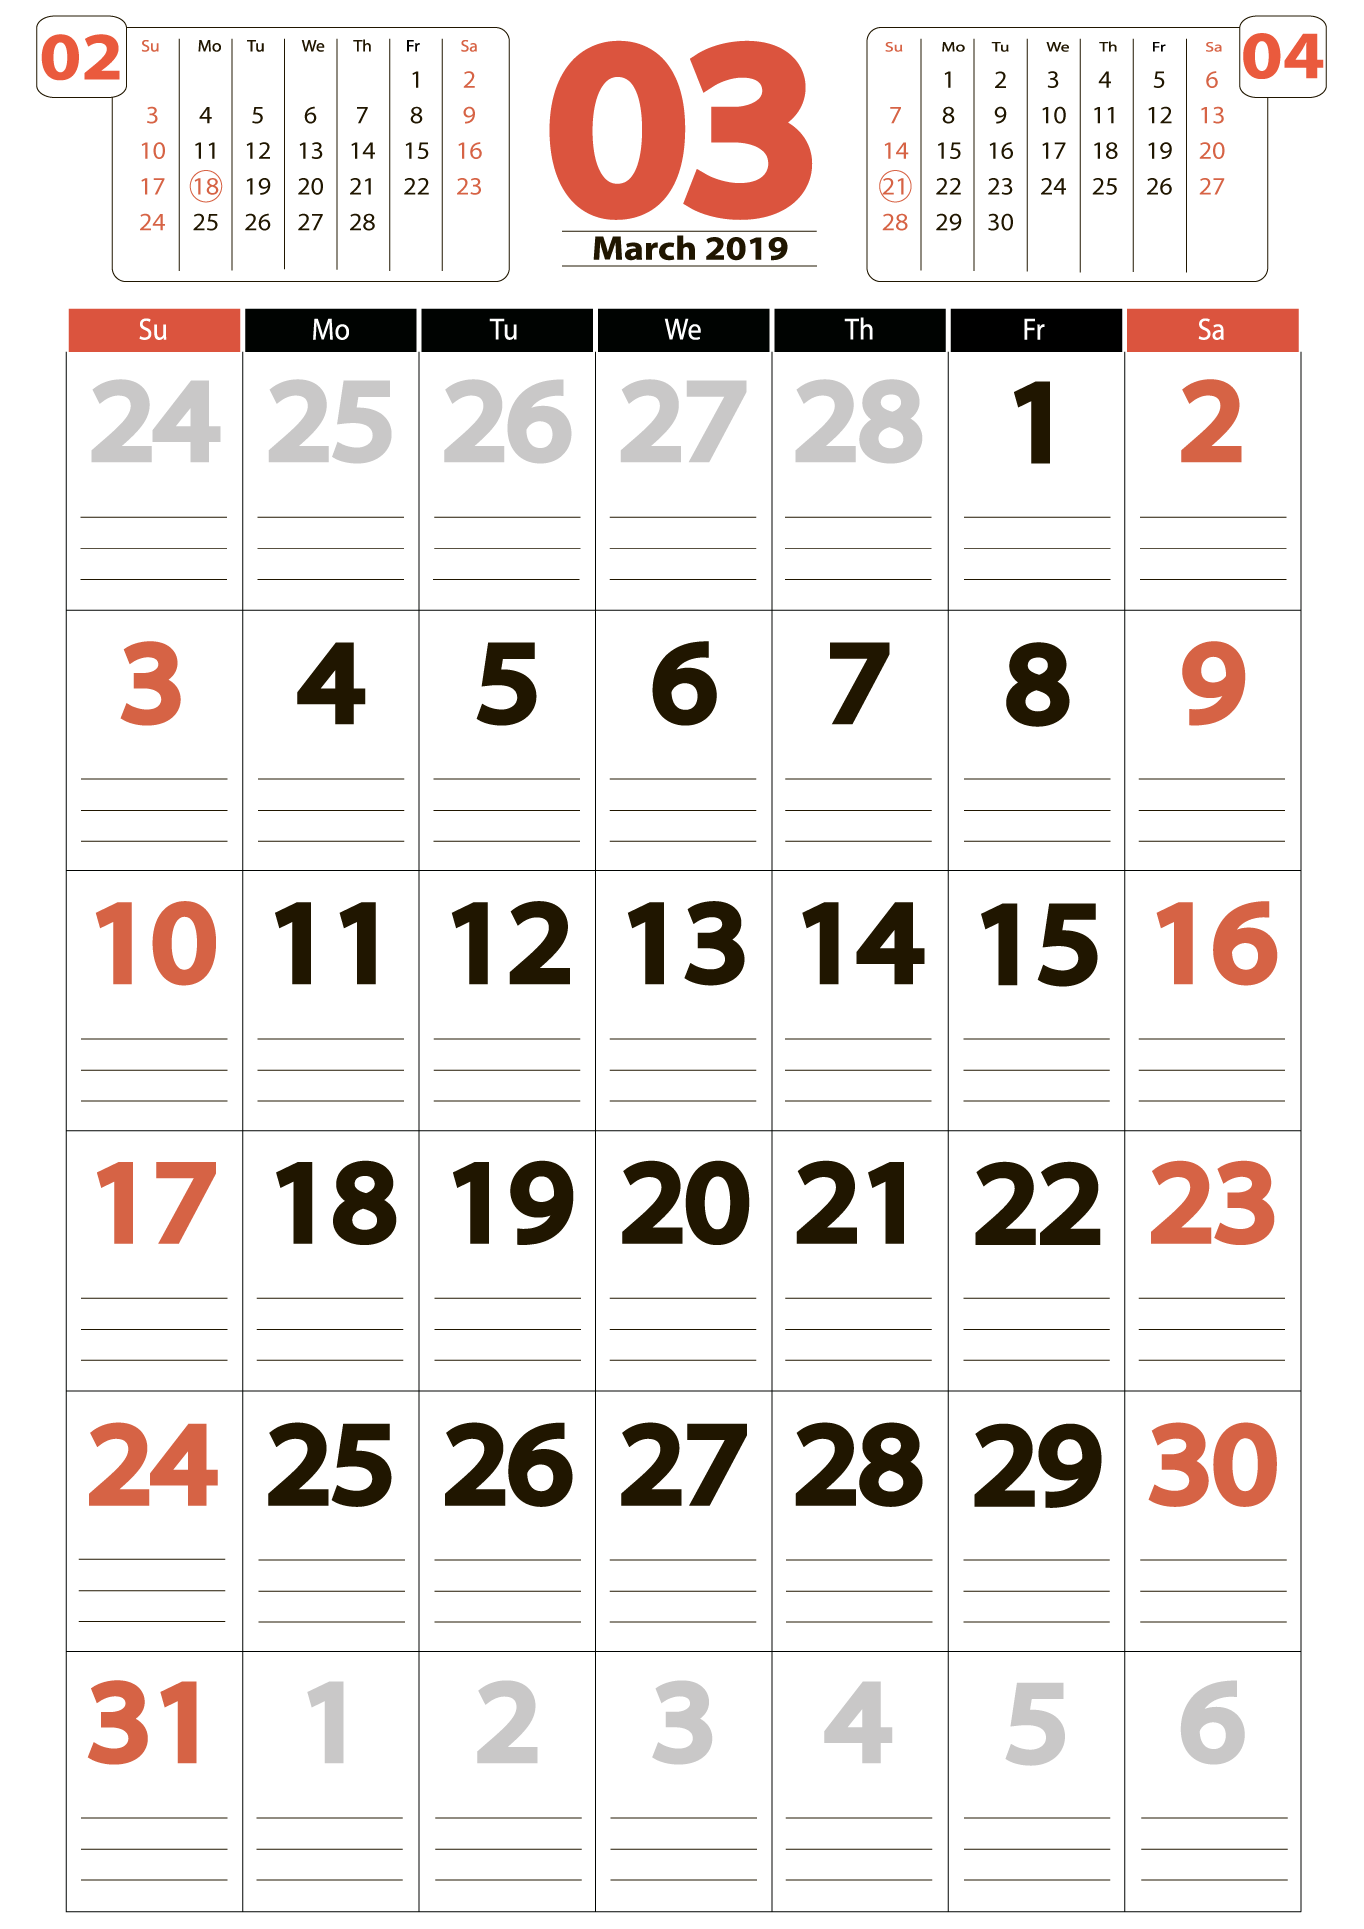 Download calendar 03 2019